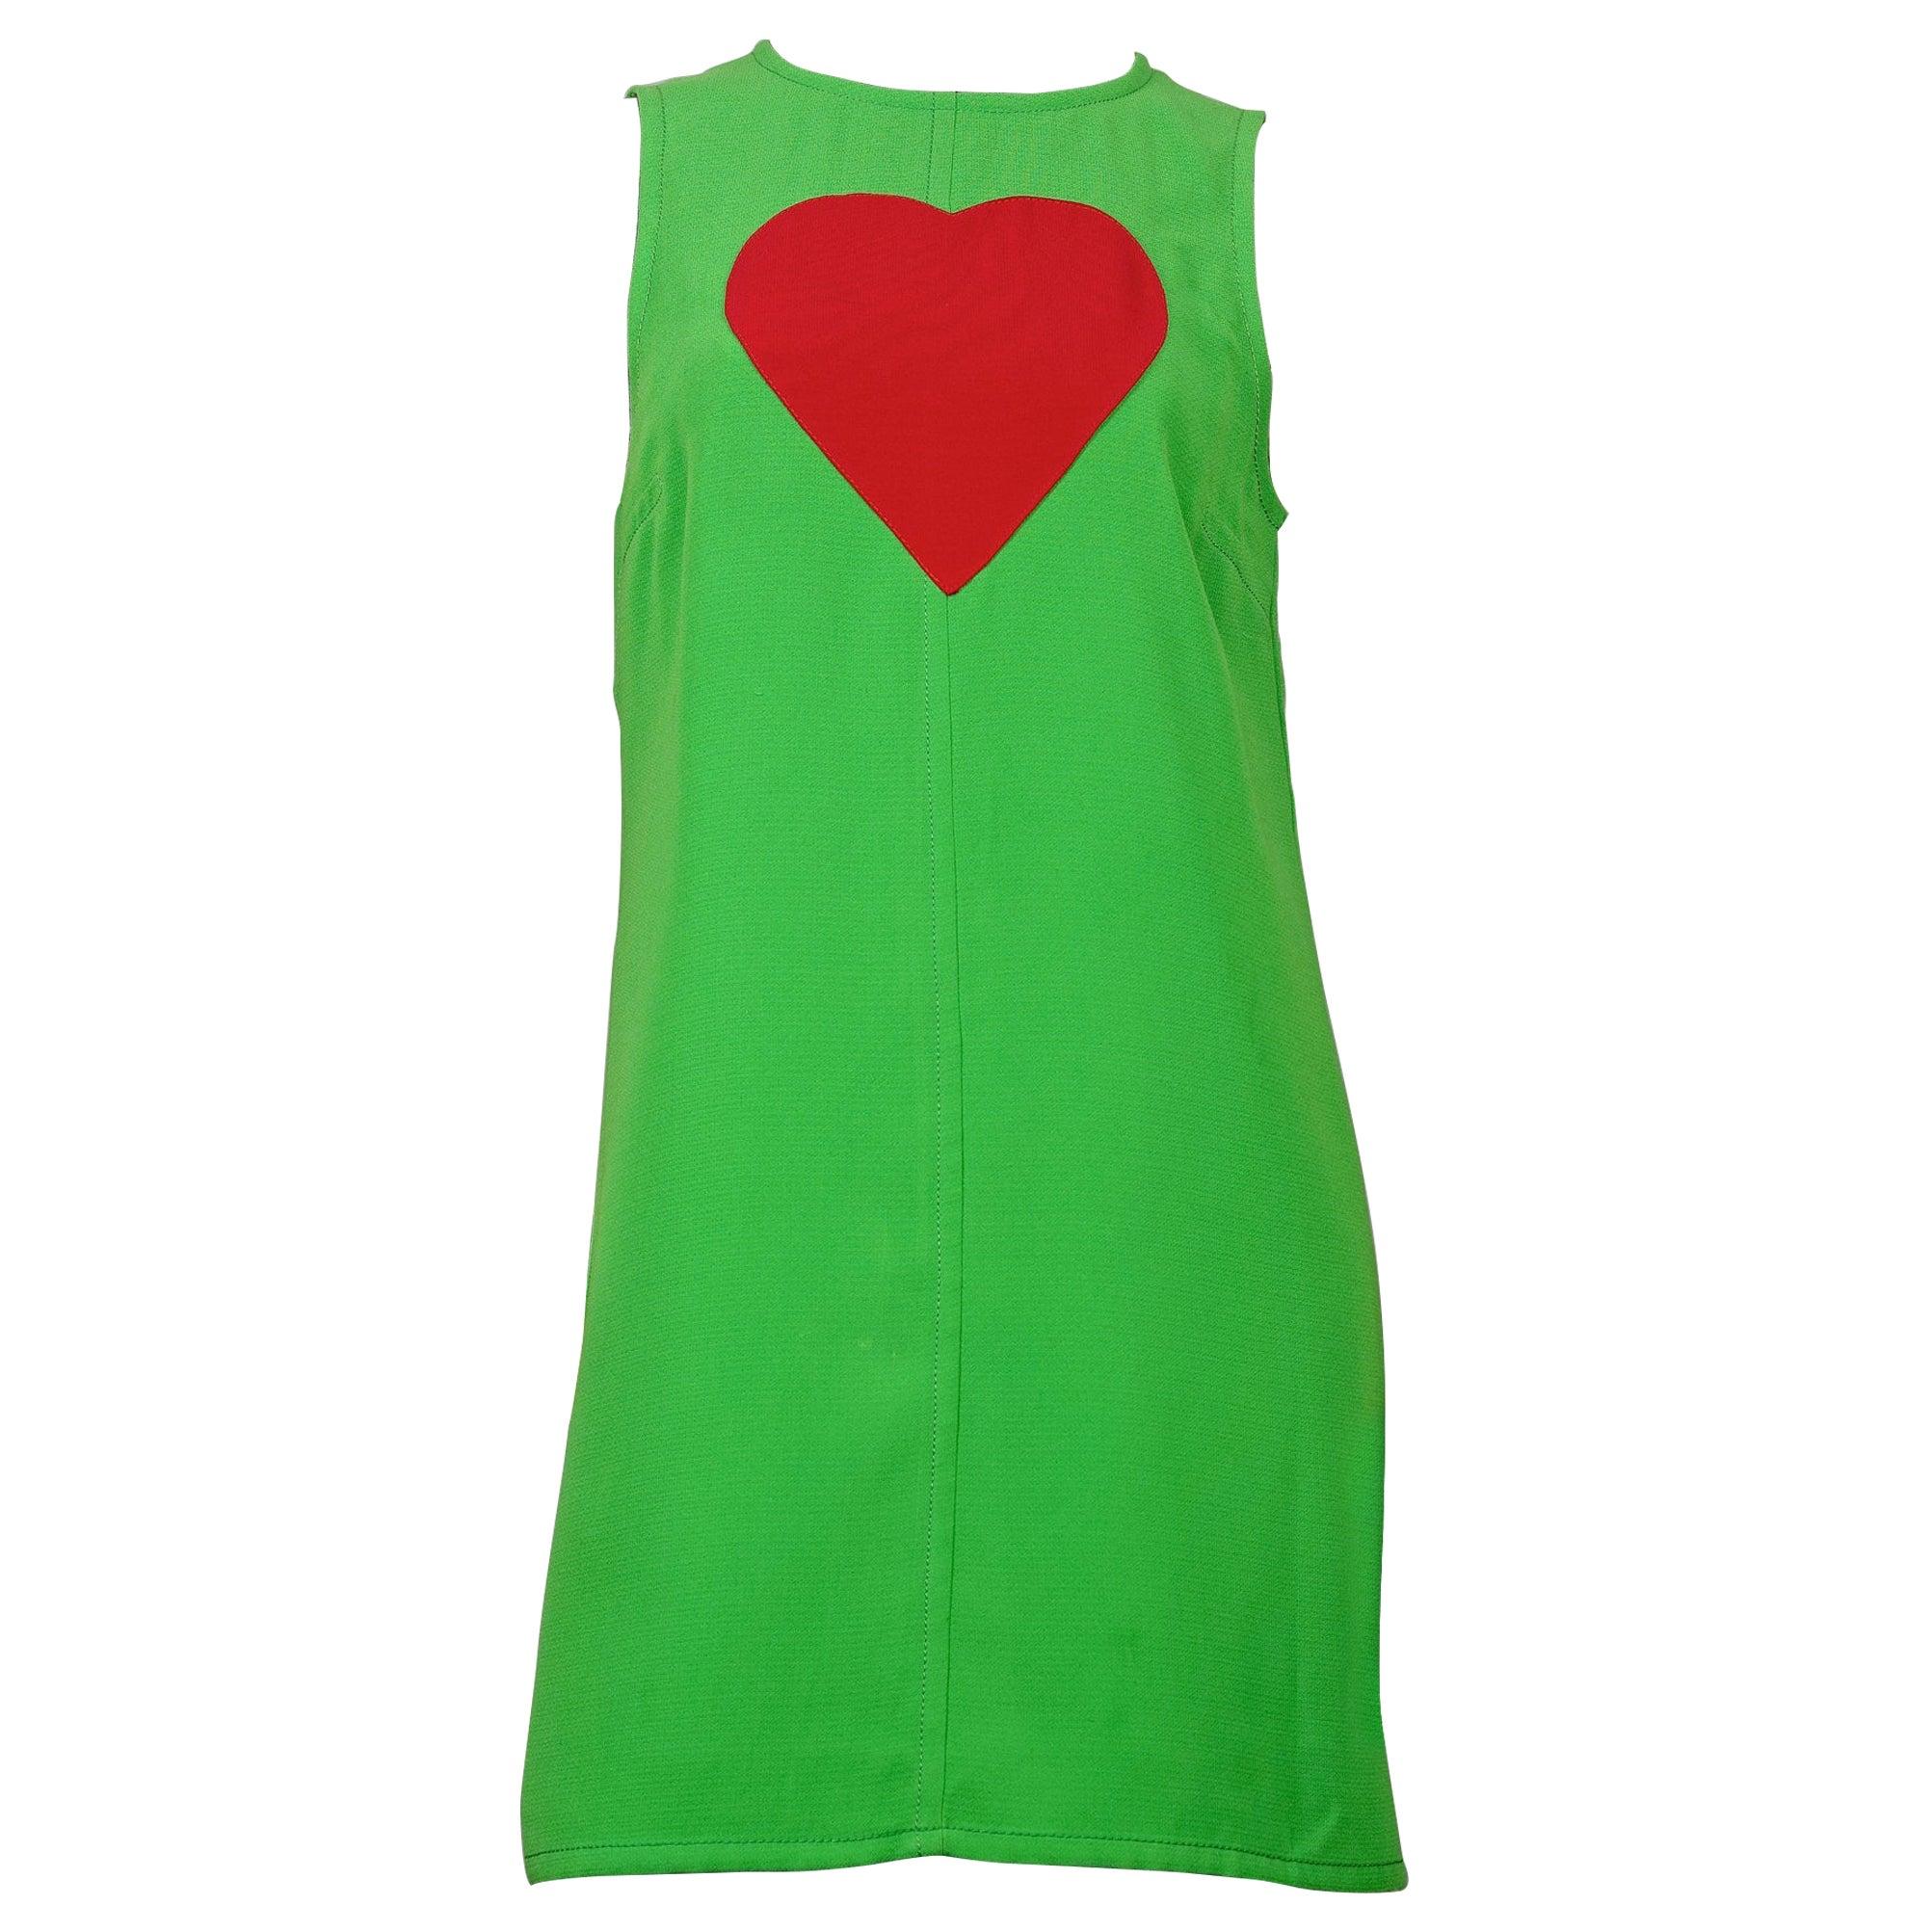 Vintage 1970s YVES SAINT LAURENT Heart Pop Art Dress